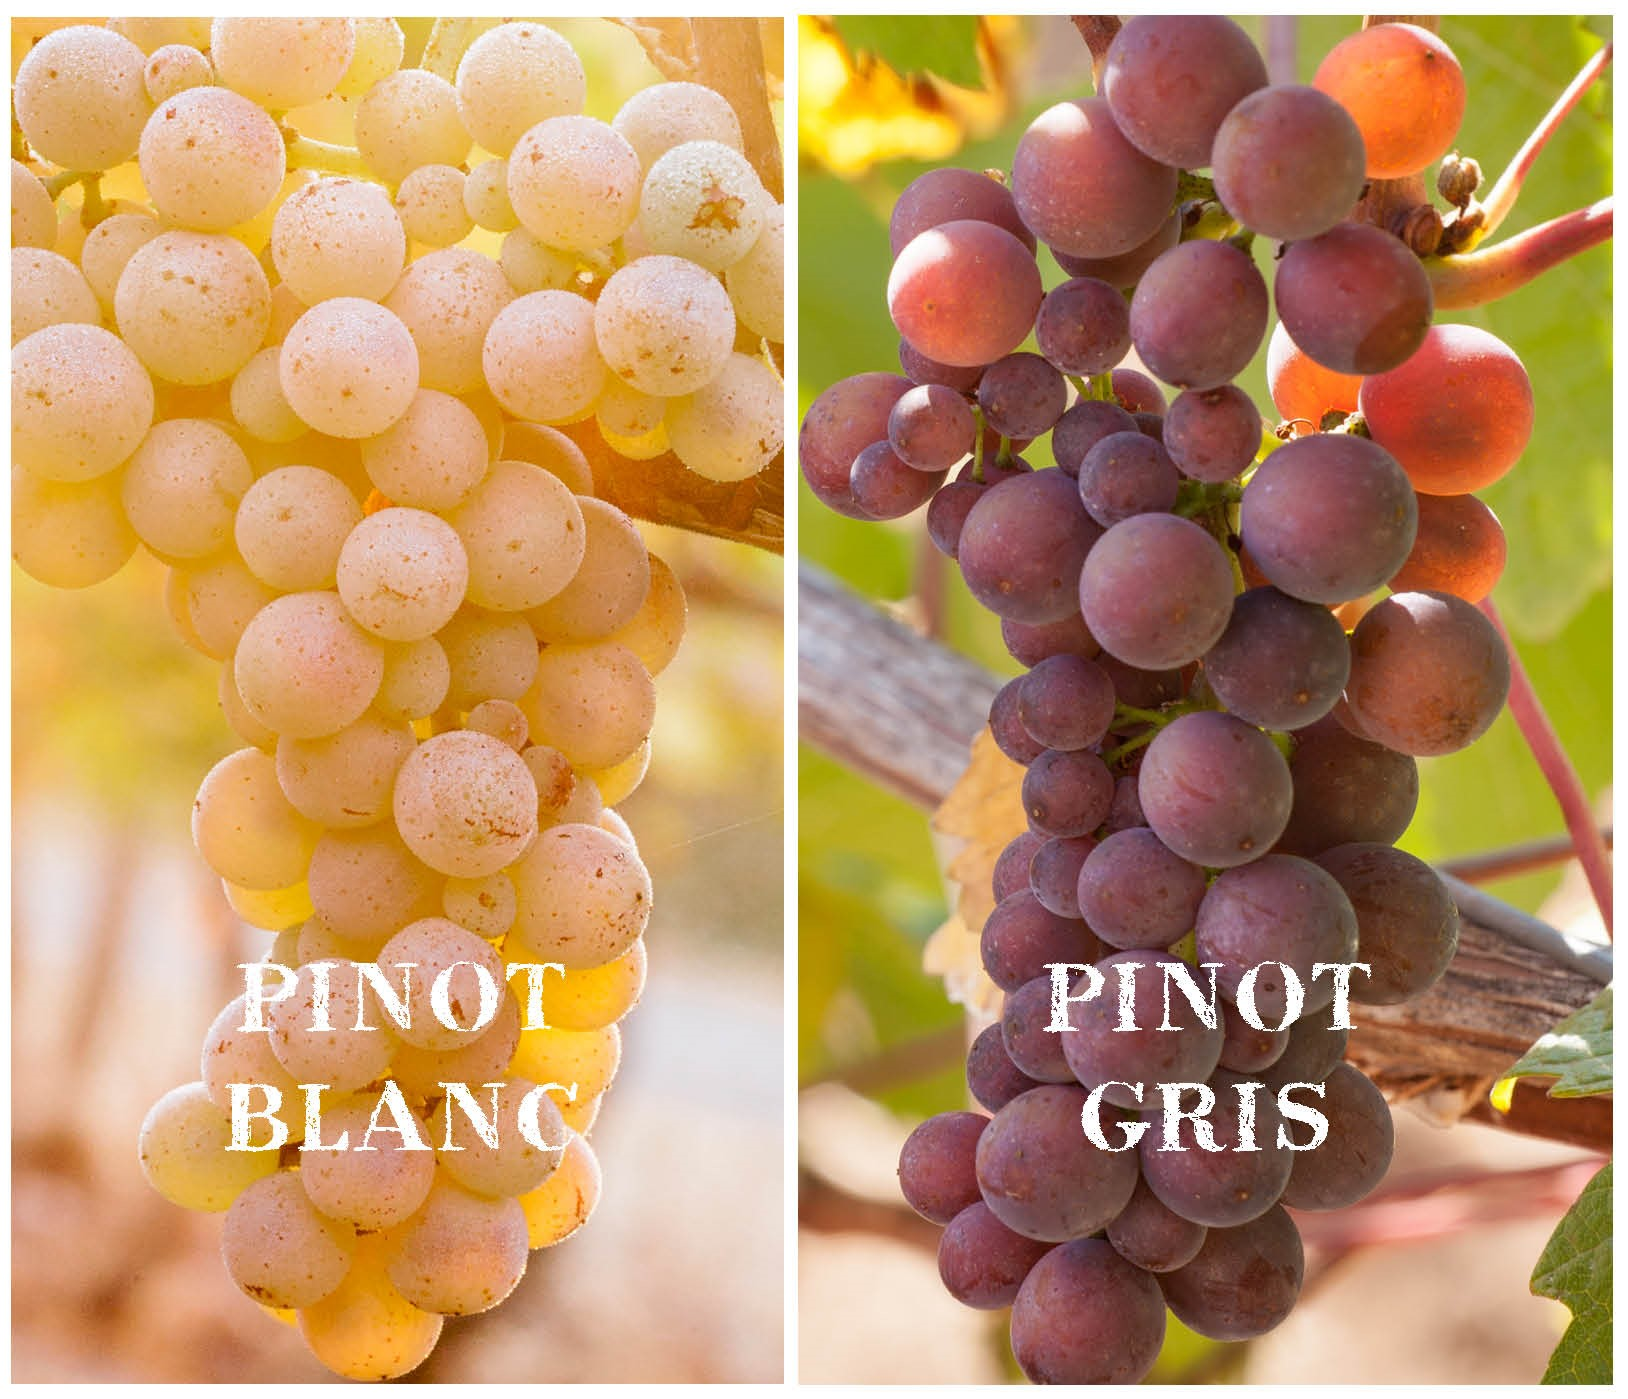 Pinot-Gris-vs-Pinot-Blanc